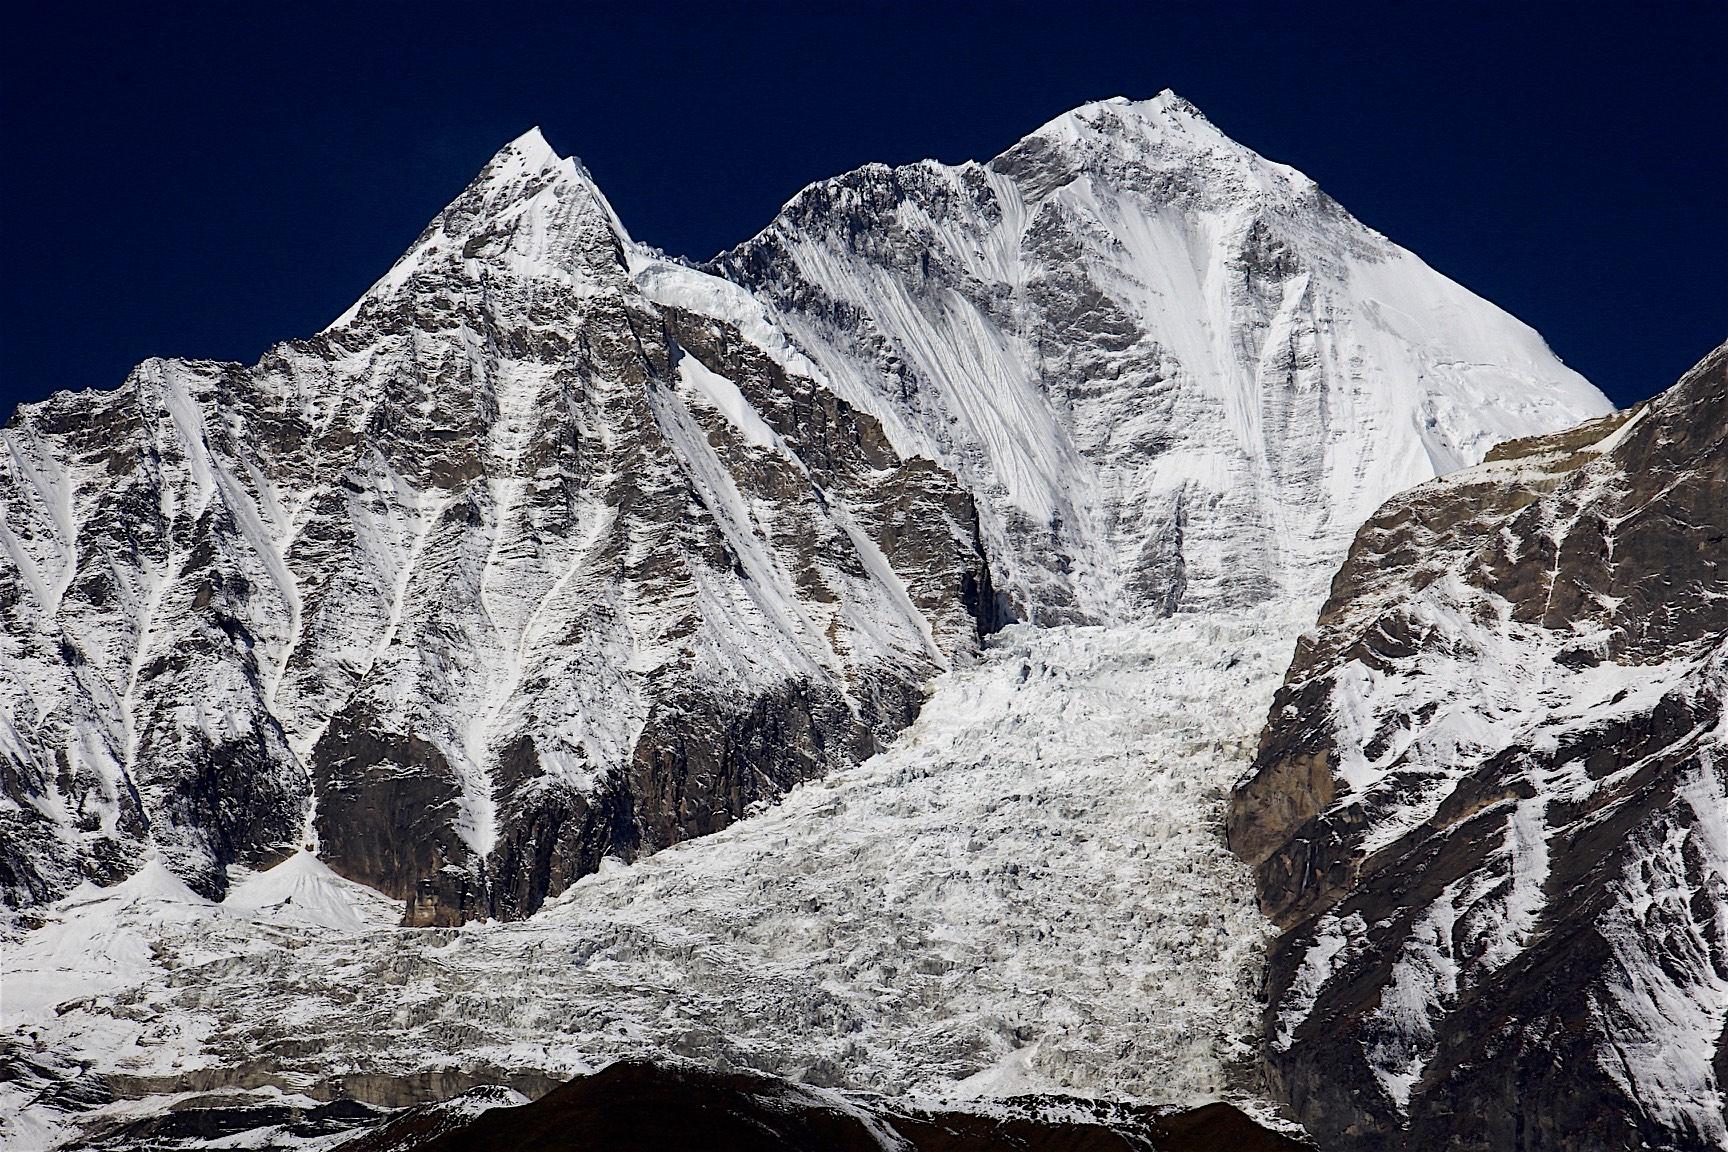 East wall of Dhaulagiri - climbed by Voytek Kurtyka and Tomas Humar